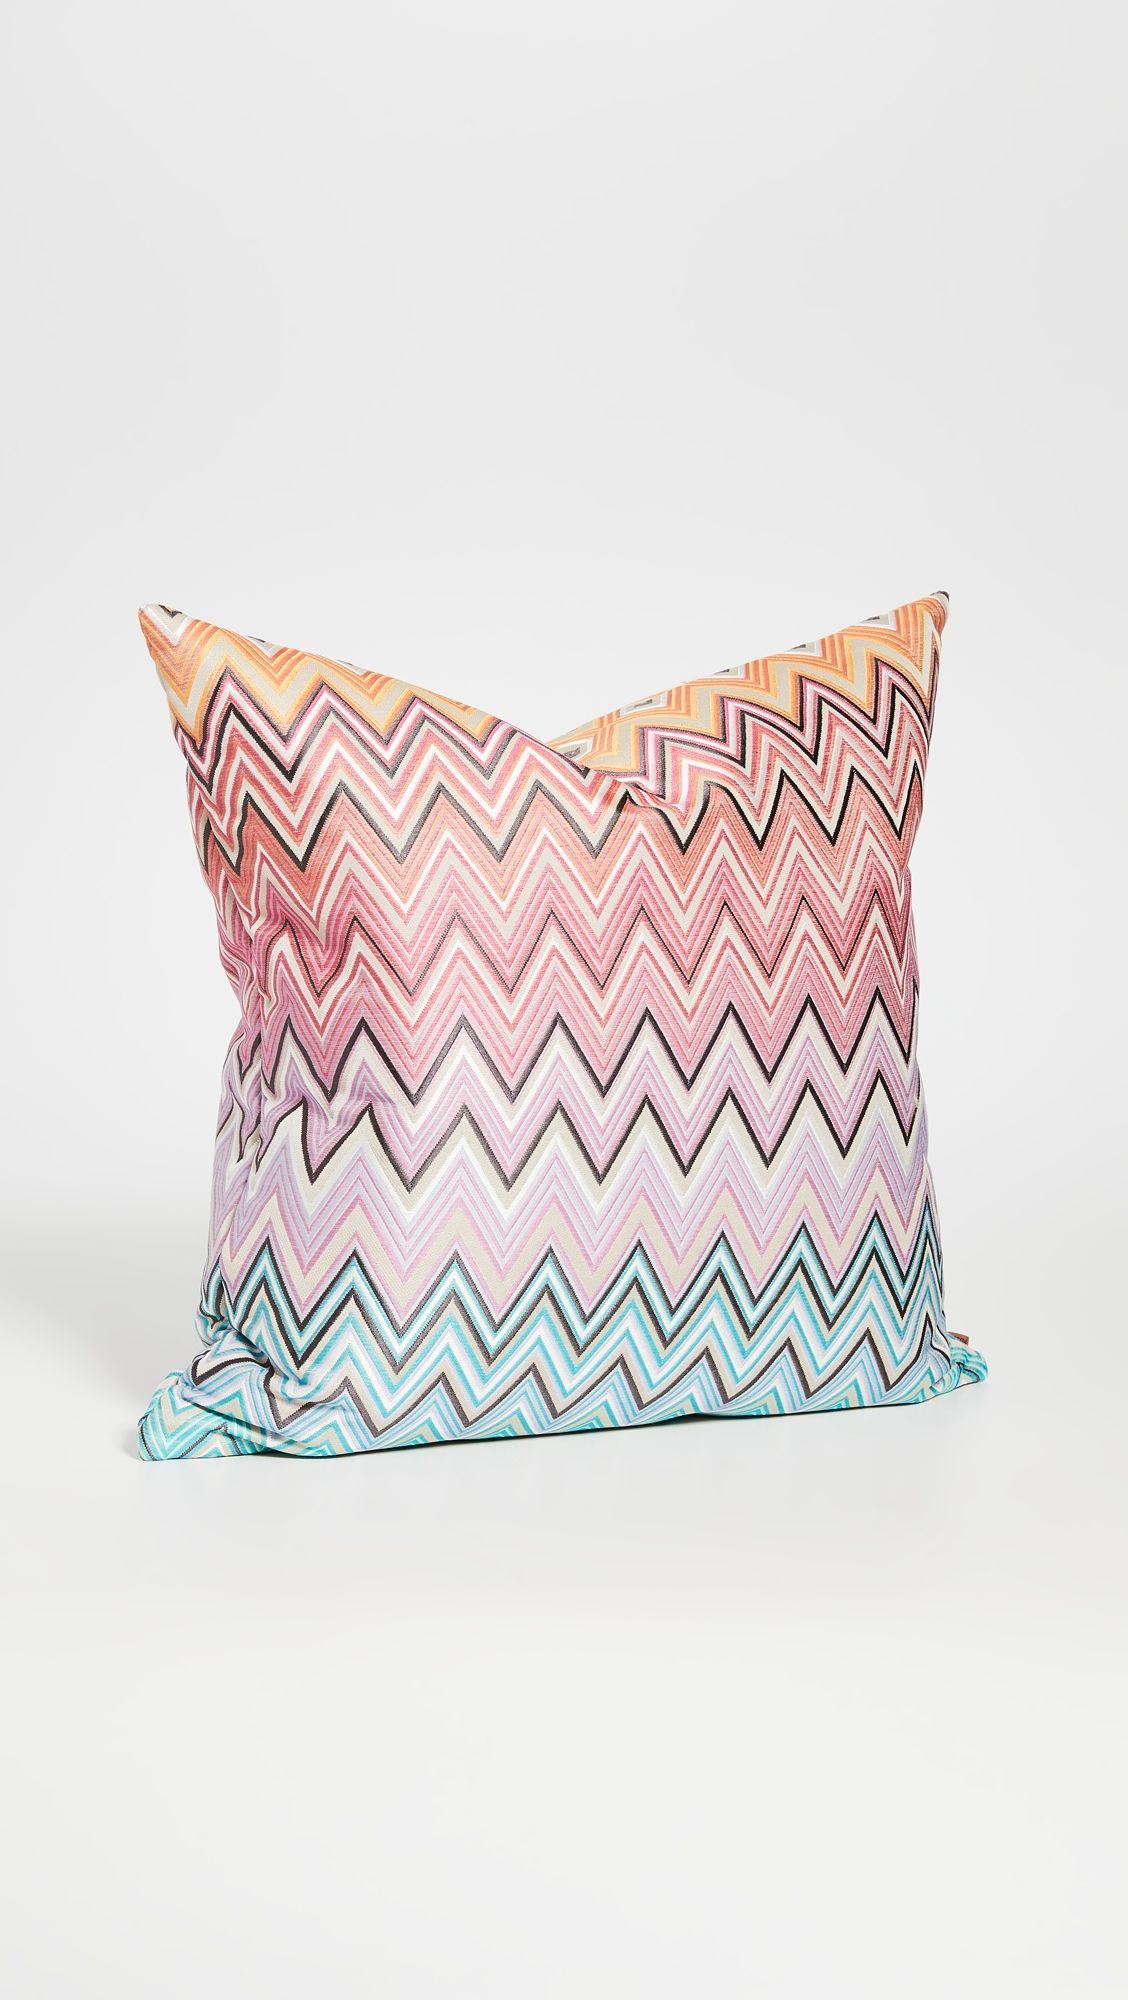 yanai cushion missoni home cushions